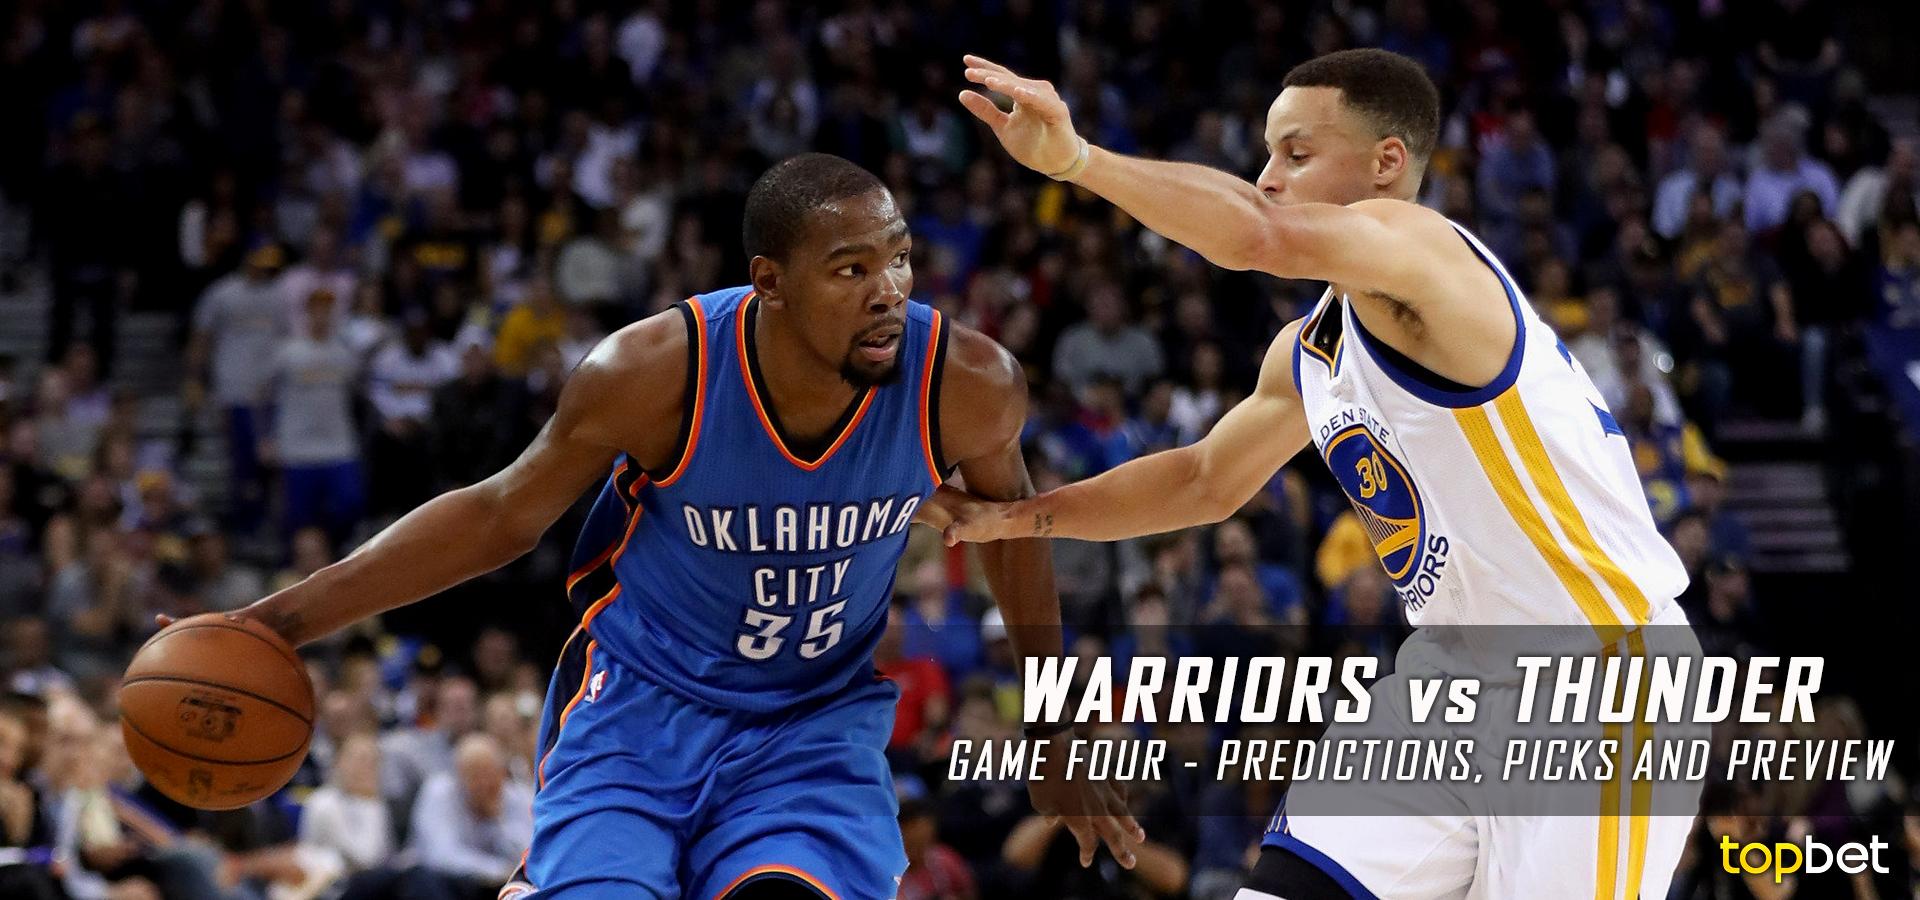 Warriors vs Thunder Series Game 4 Predictions, Picks, Odds